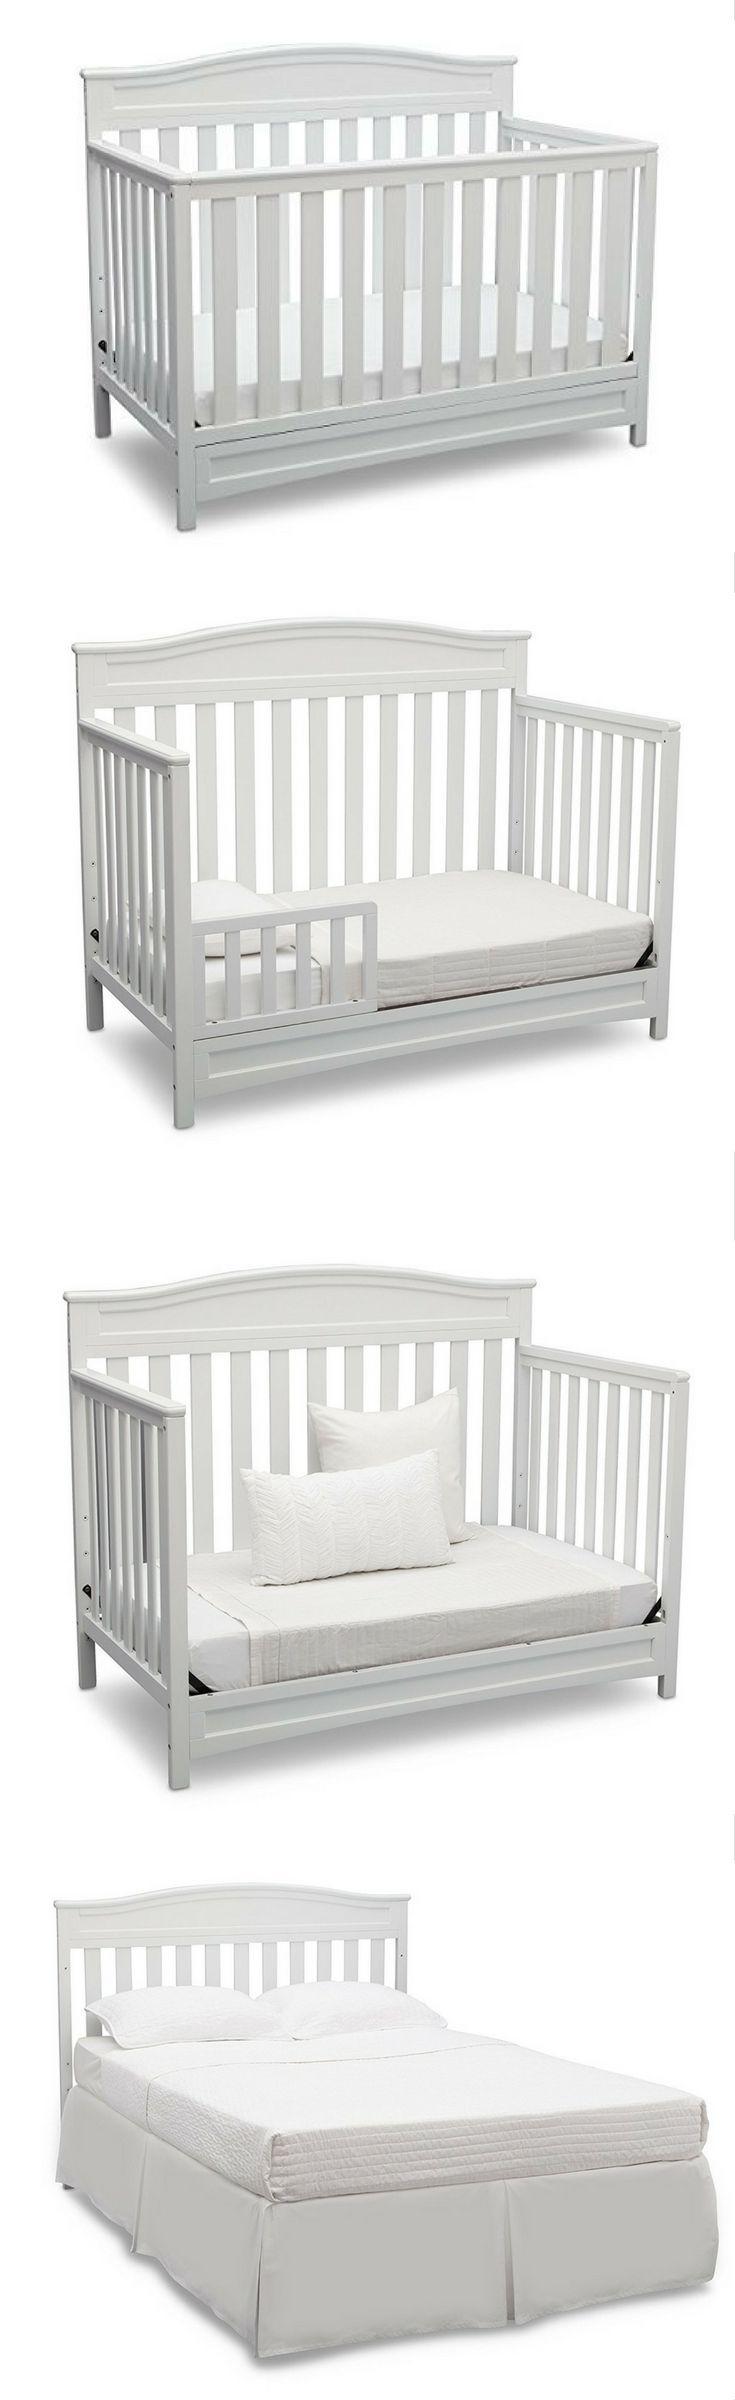 Delta Children Emery 4-in-1 Crib, White  #Affiliate